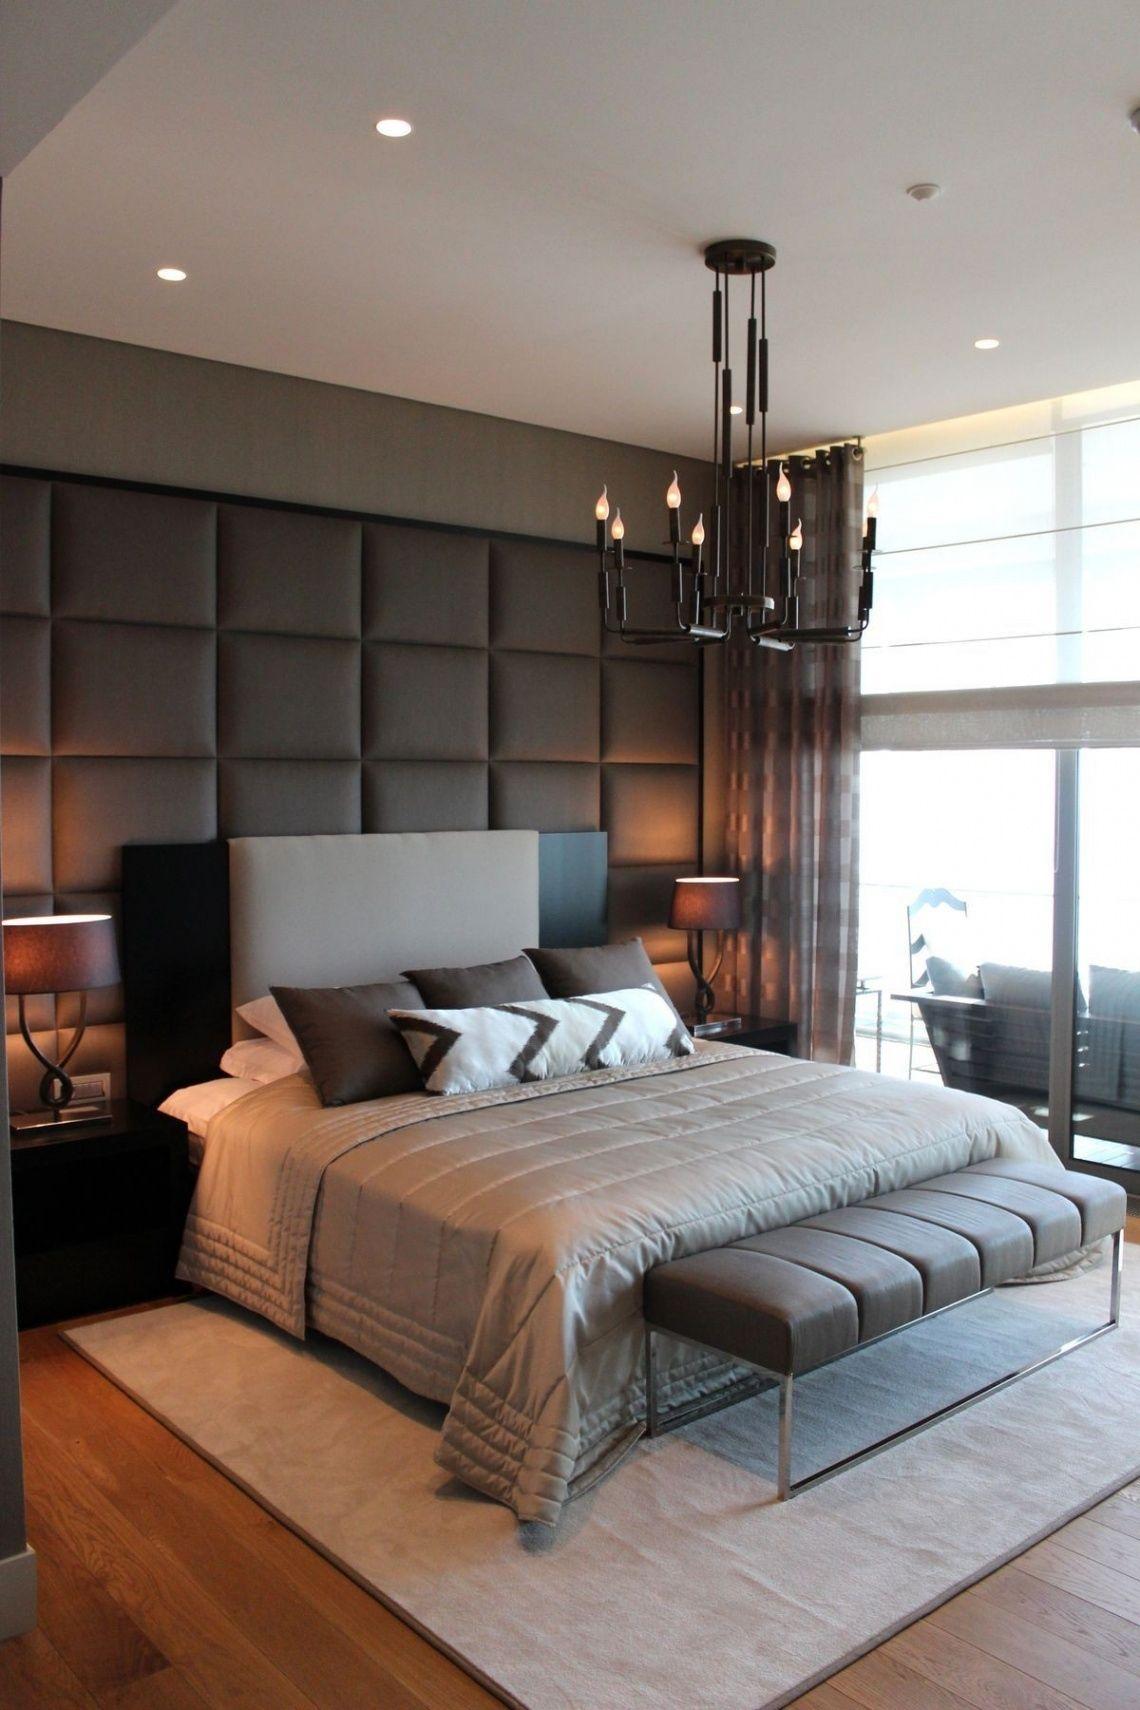 209 Modele Deco Chambre Modern